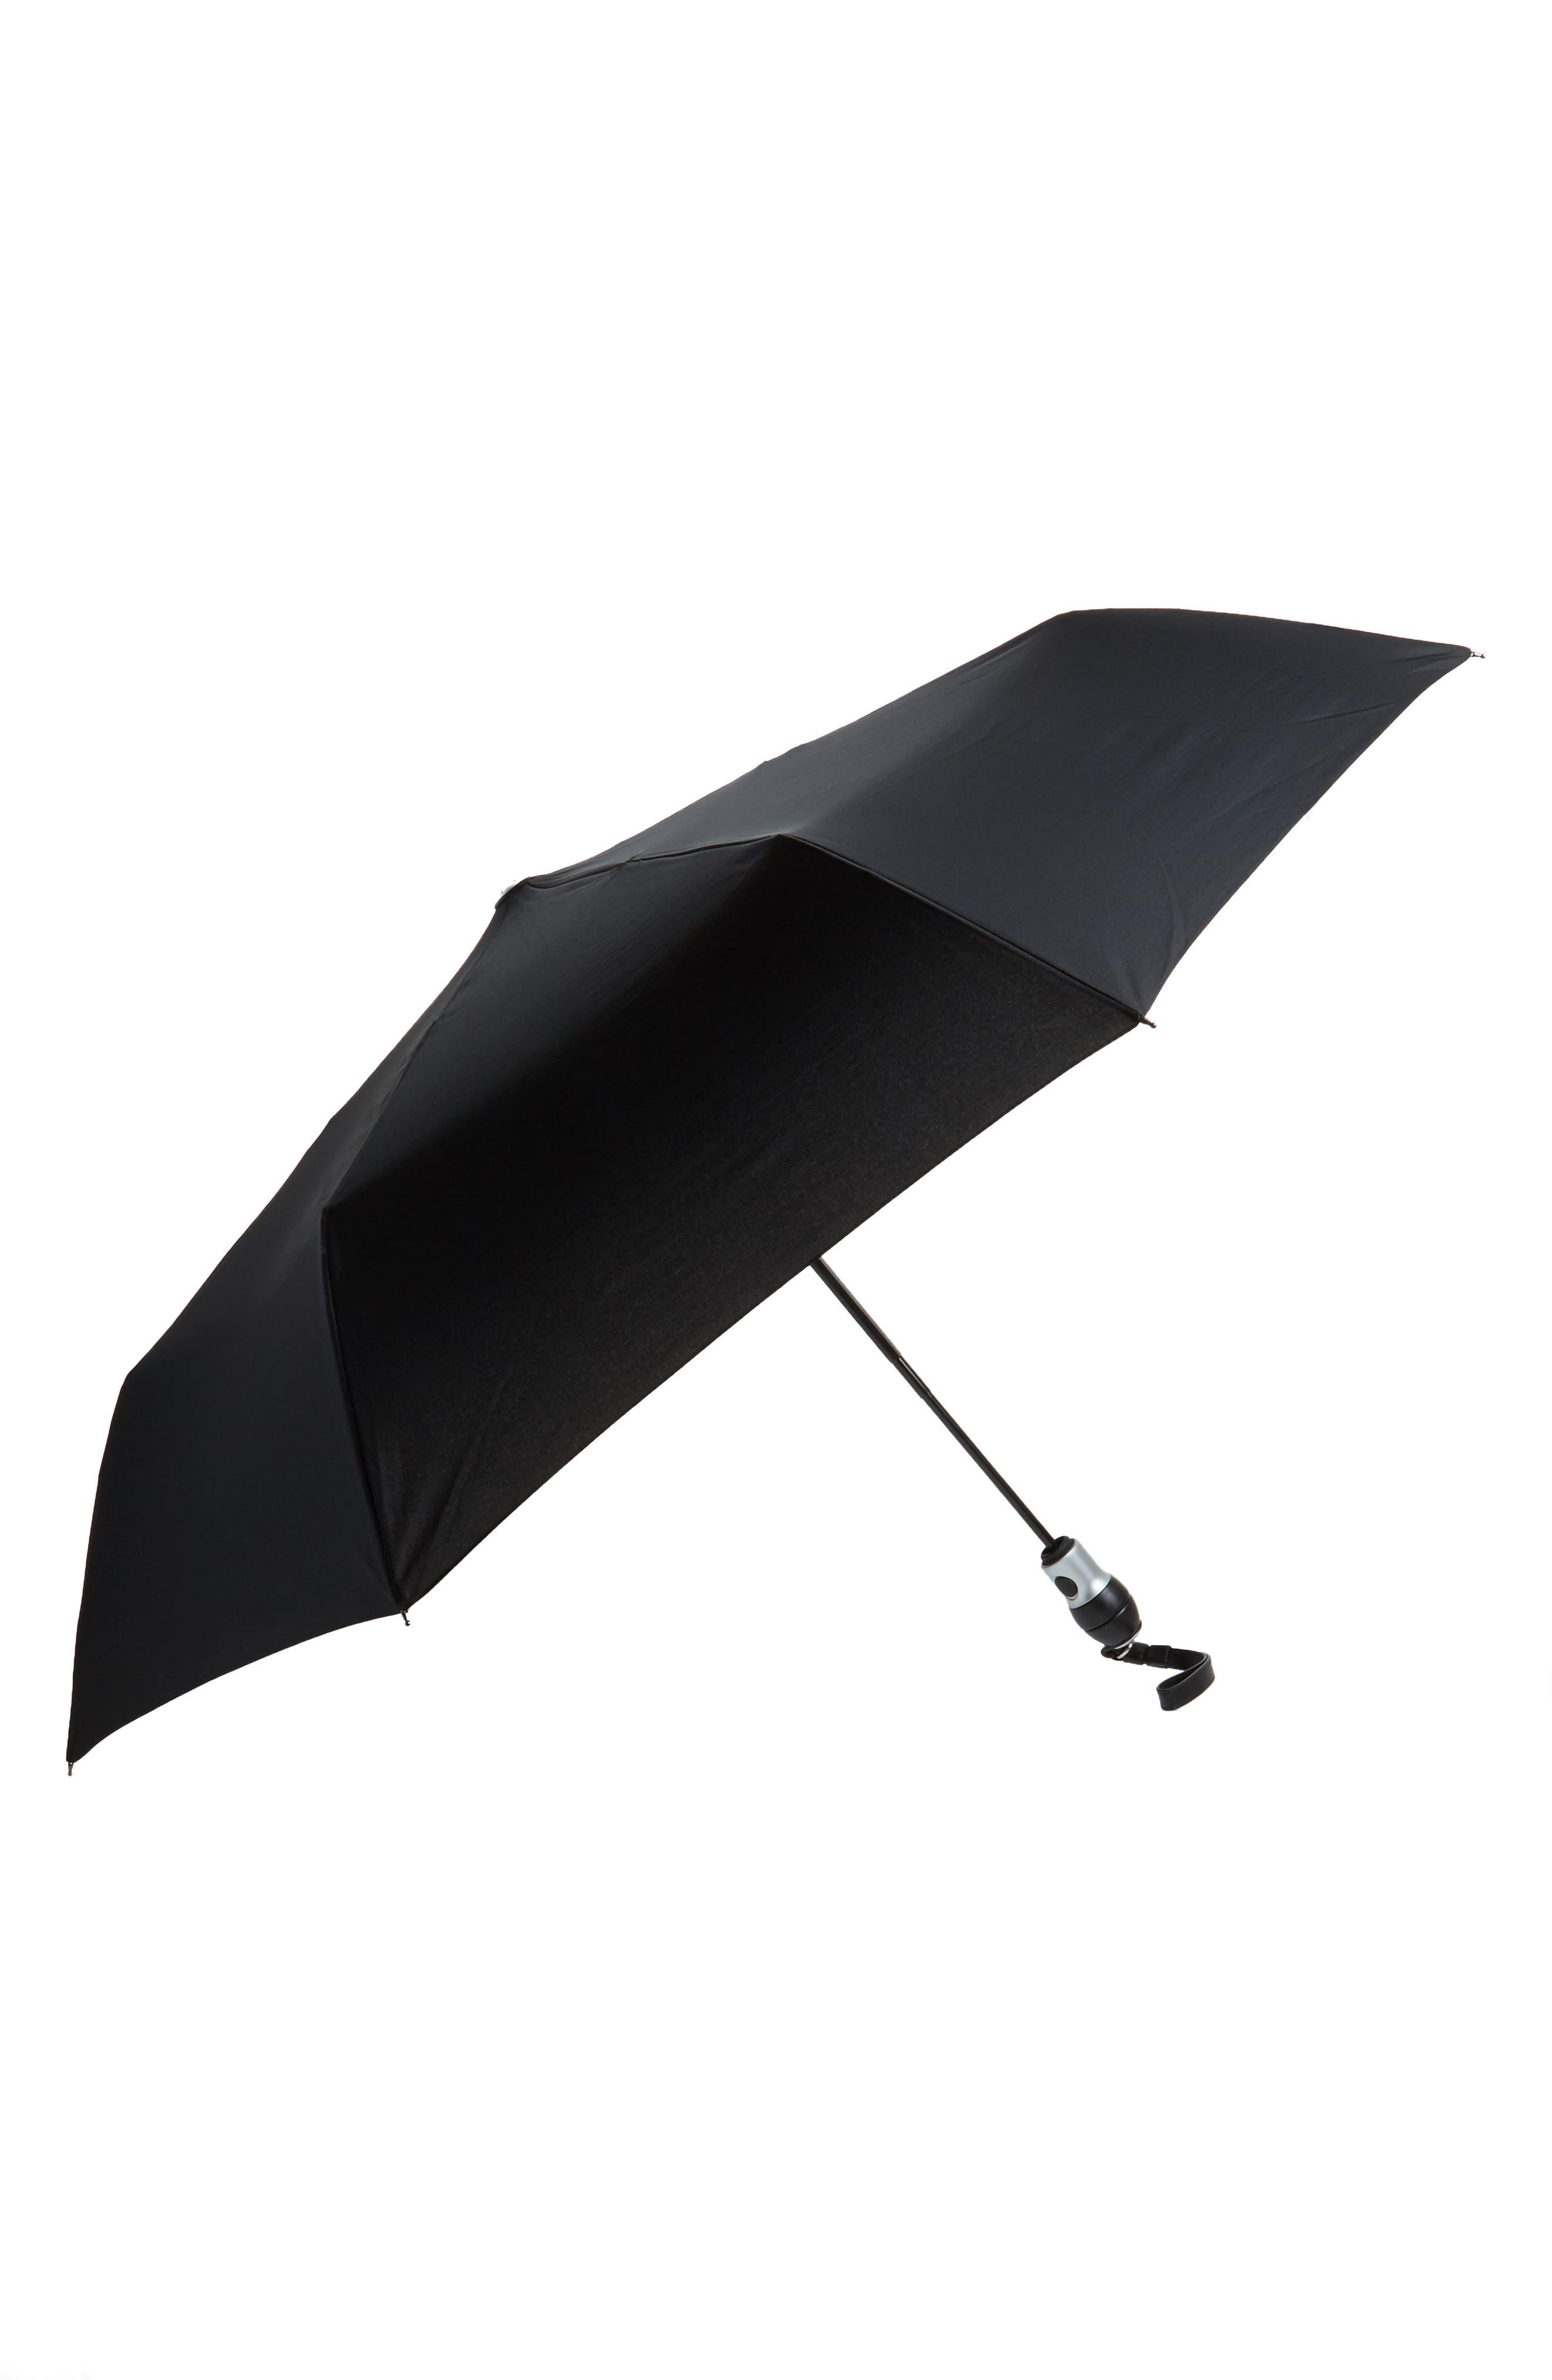 Large Umbrella,                             Main thumbnail 1, color,                             CLASSIC BLACK